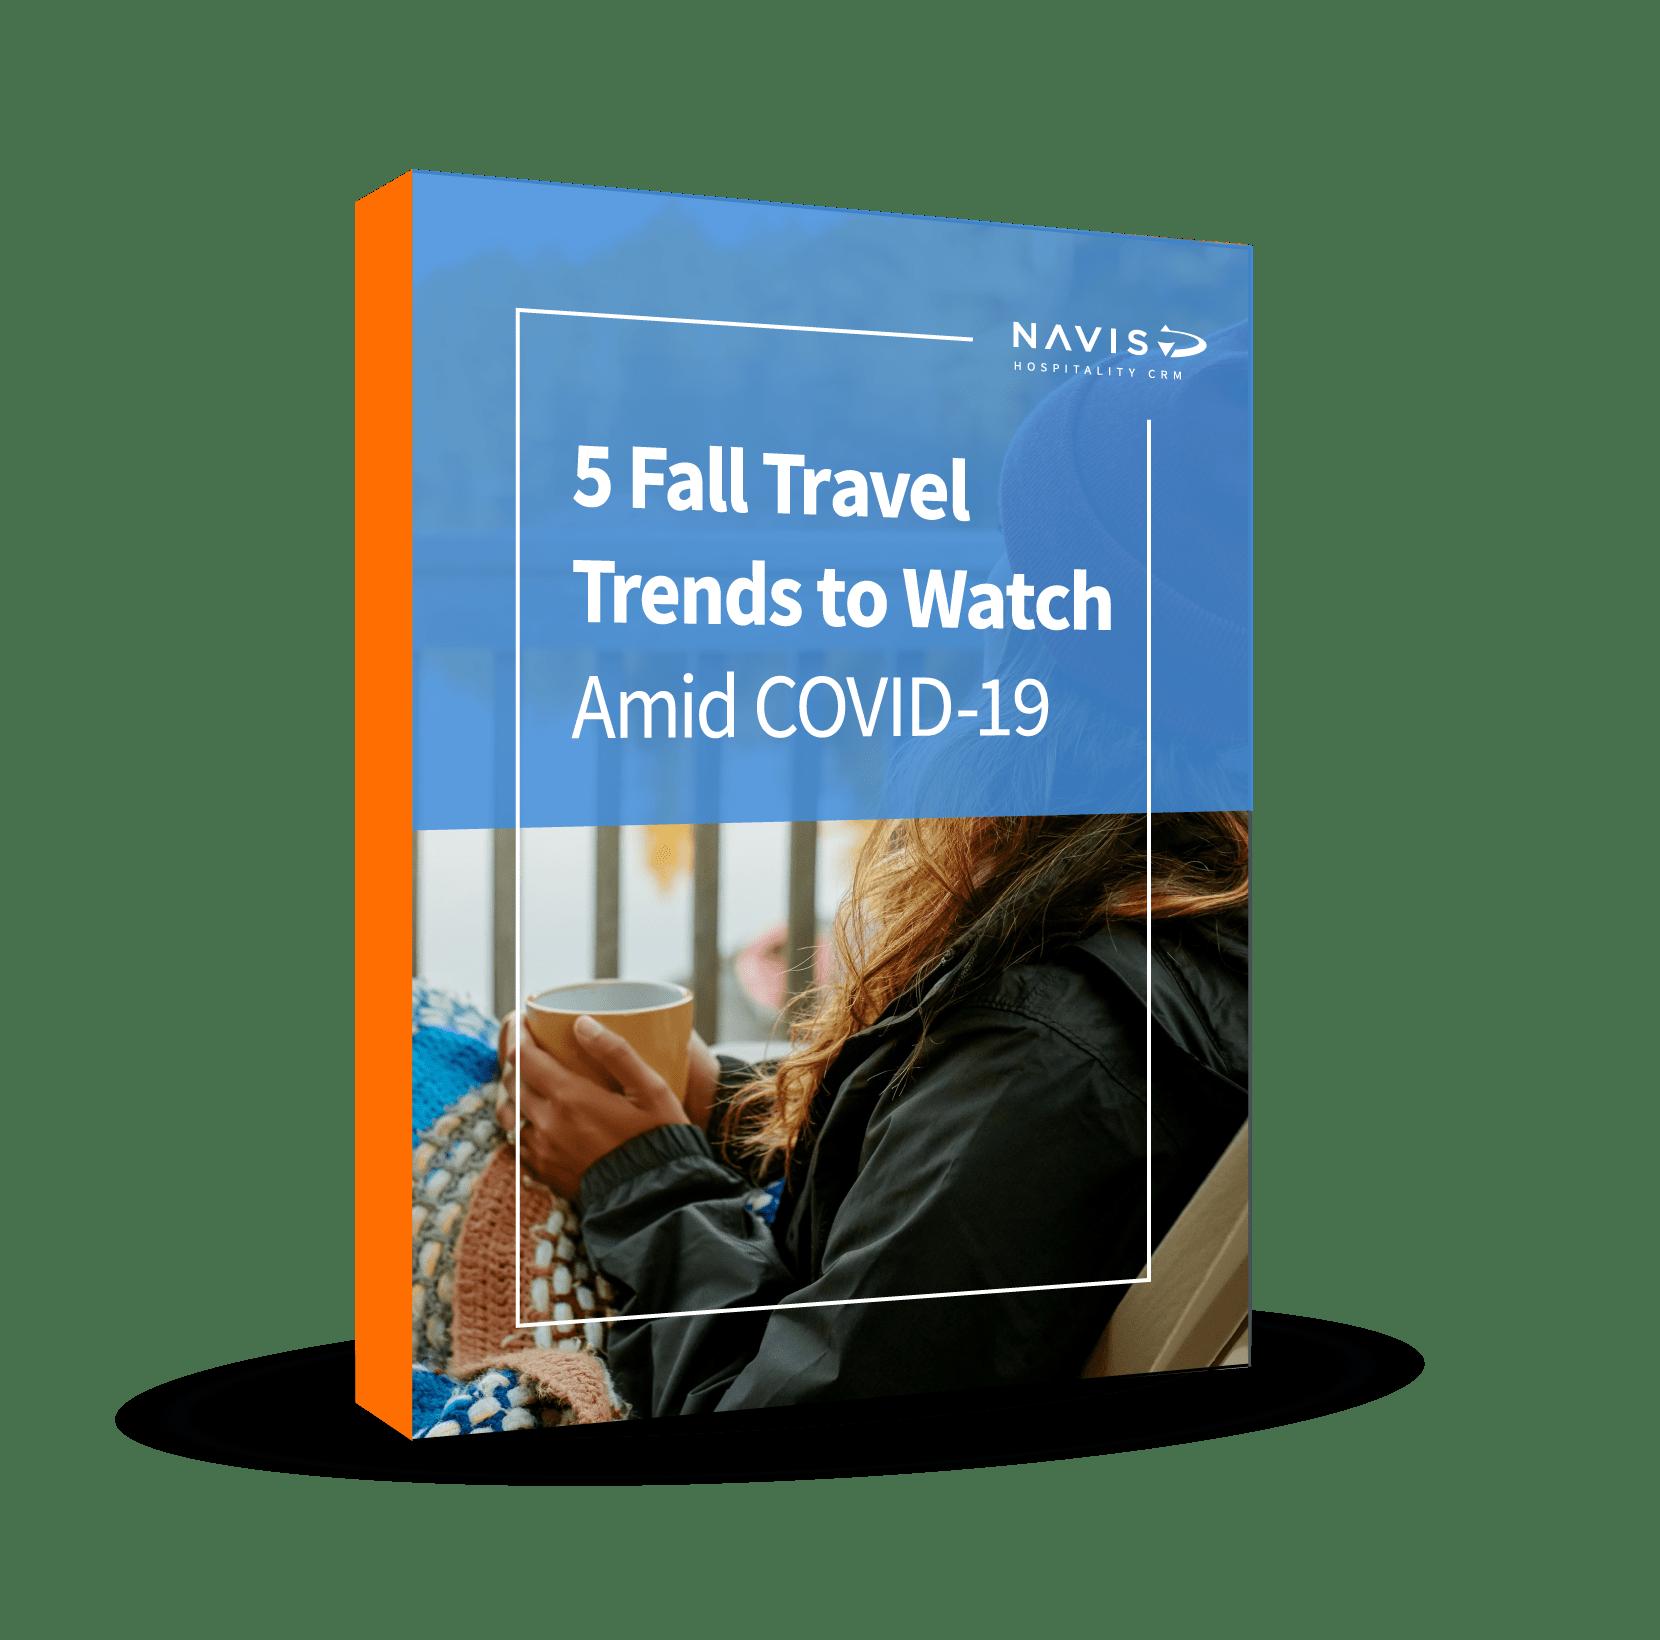 5 Fall Travel Trends eBook